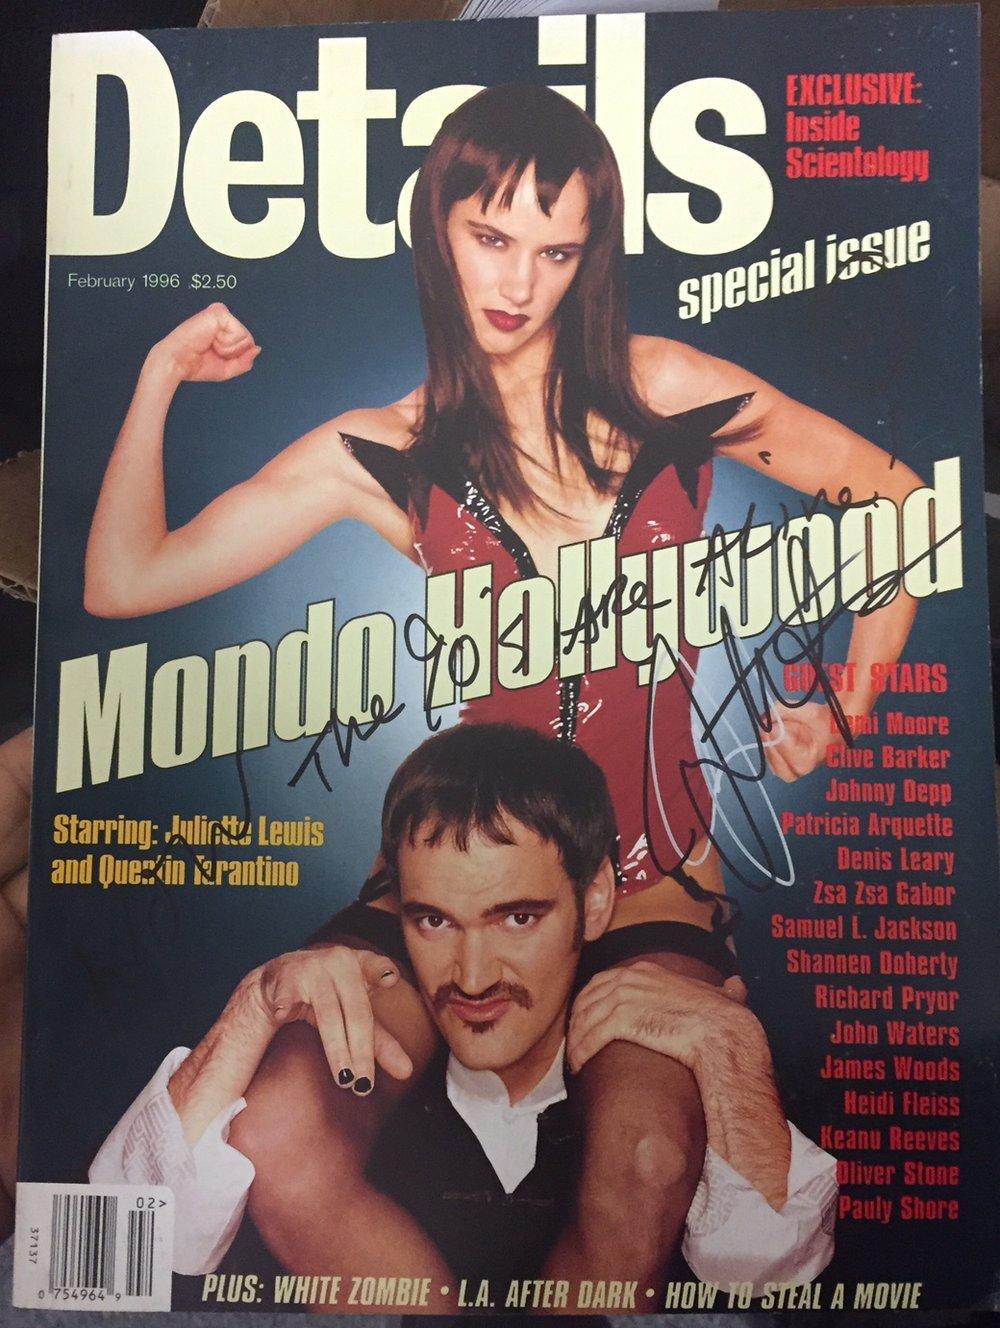 Image of *Signed Collectors Item* Original Details Mag 1996